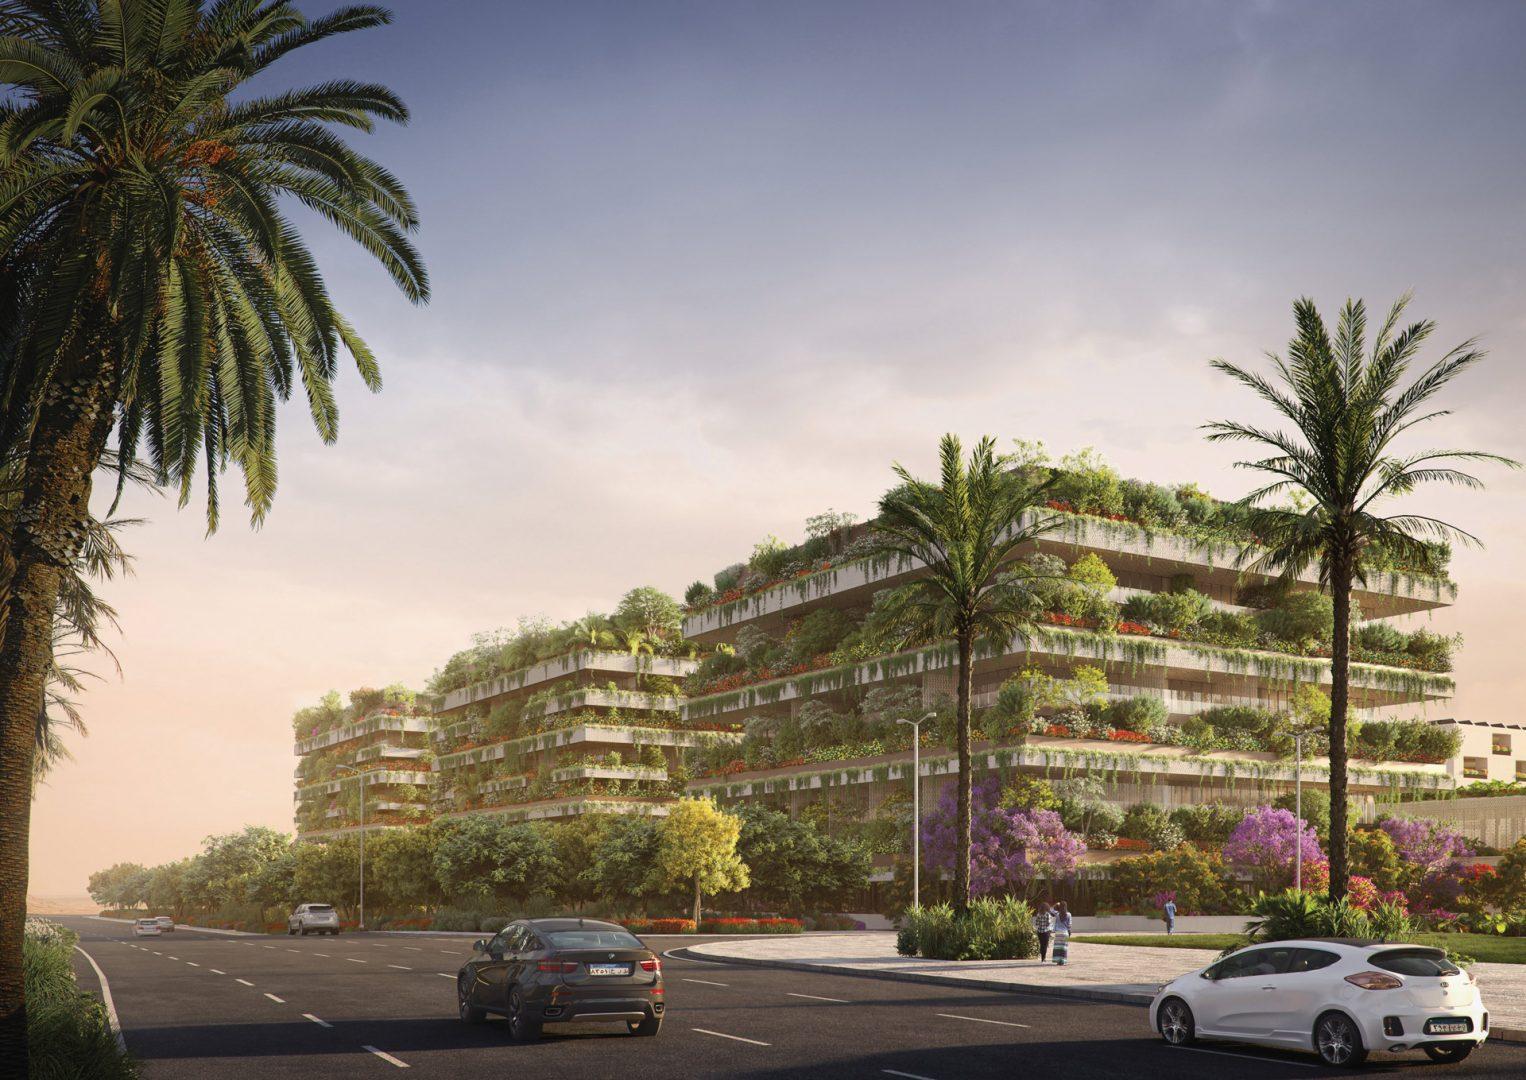 Stefano-Boeri-Architetti-MISR-Italia-Il-Bosco-Egypt-New-Administrative-Town-1